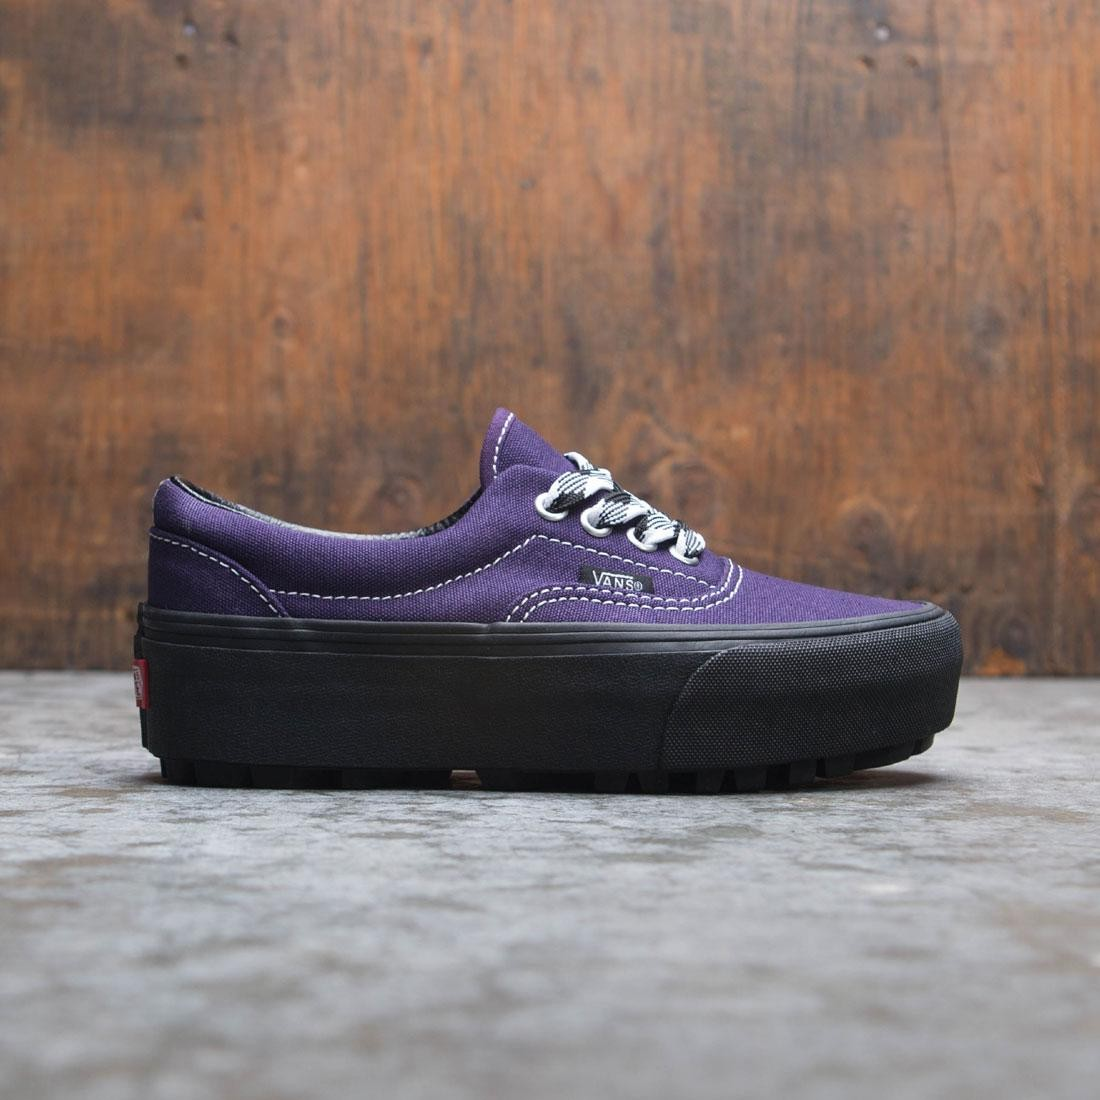 a711740fec24 Vans Women Era Lug Platform - 90s Retro purple